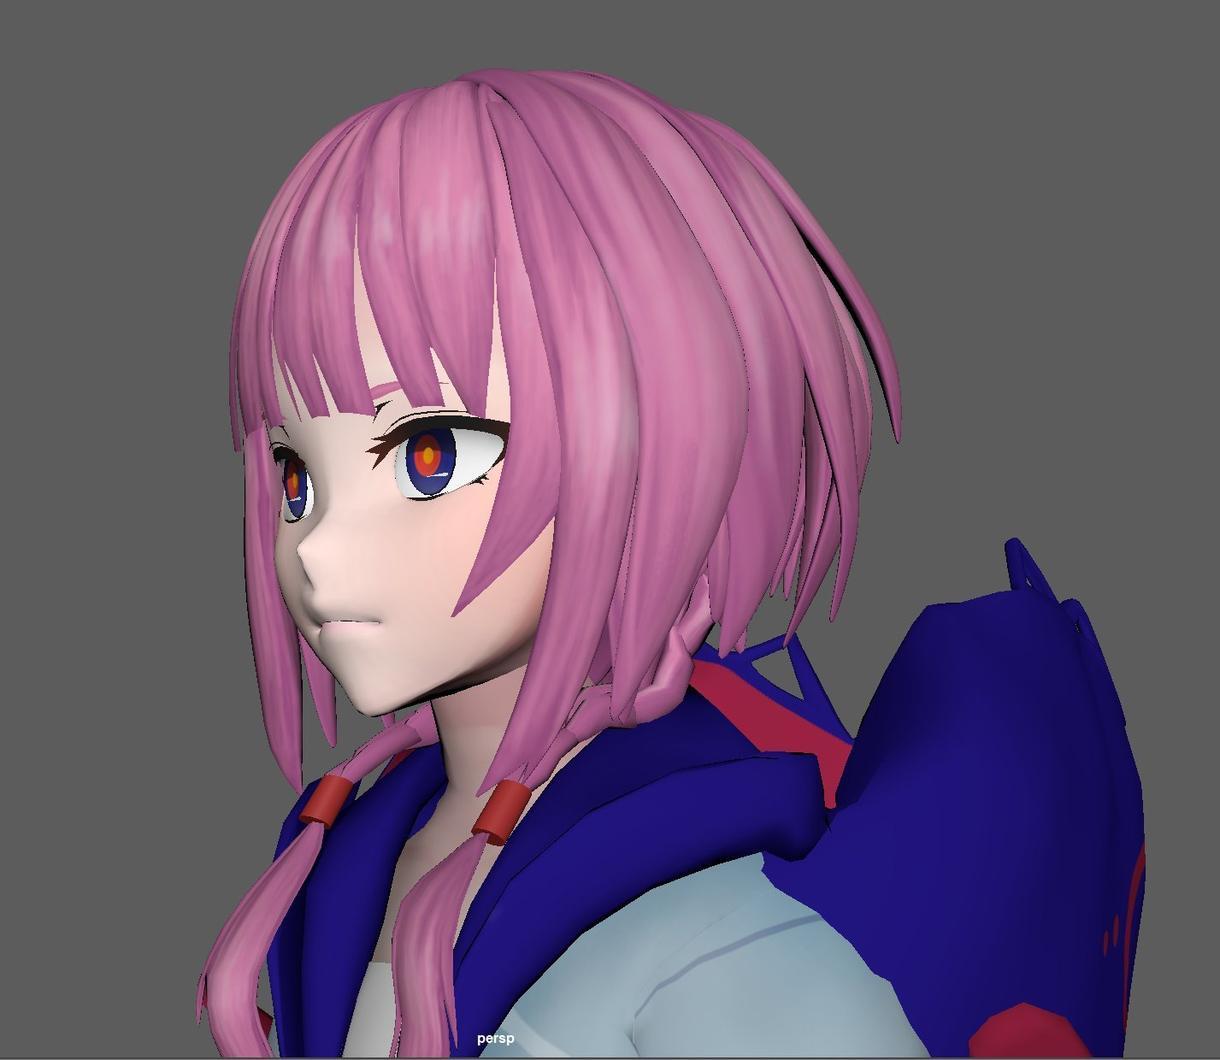 3Dモデル キャラクター 小物 作ります 小物、オリジナル・版権キャラクターのモデリング、リギングなど イメージ1